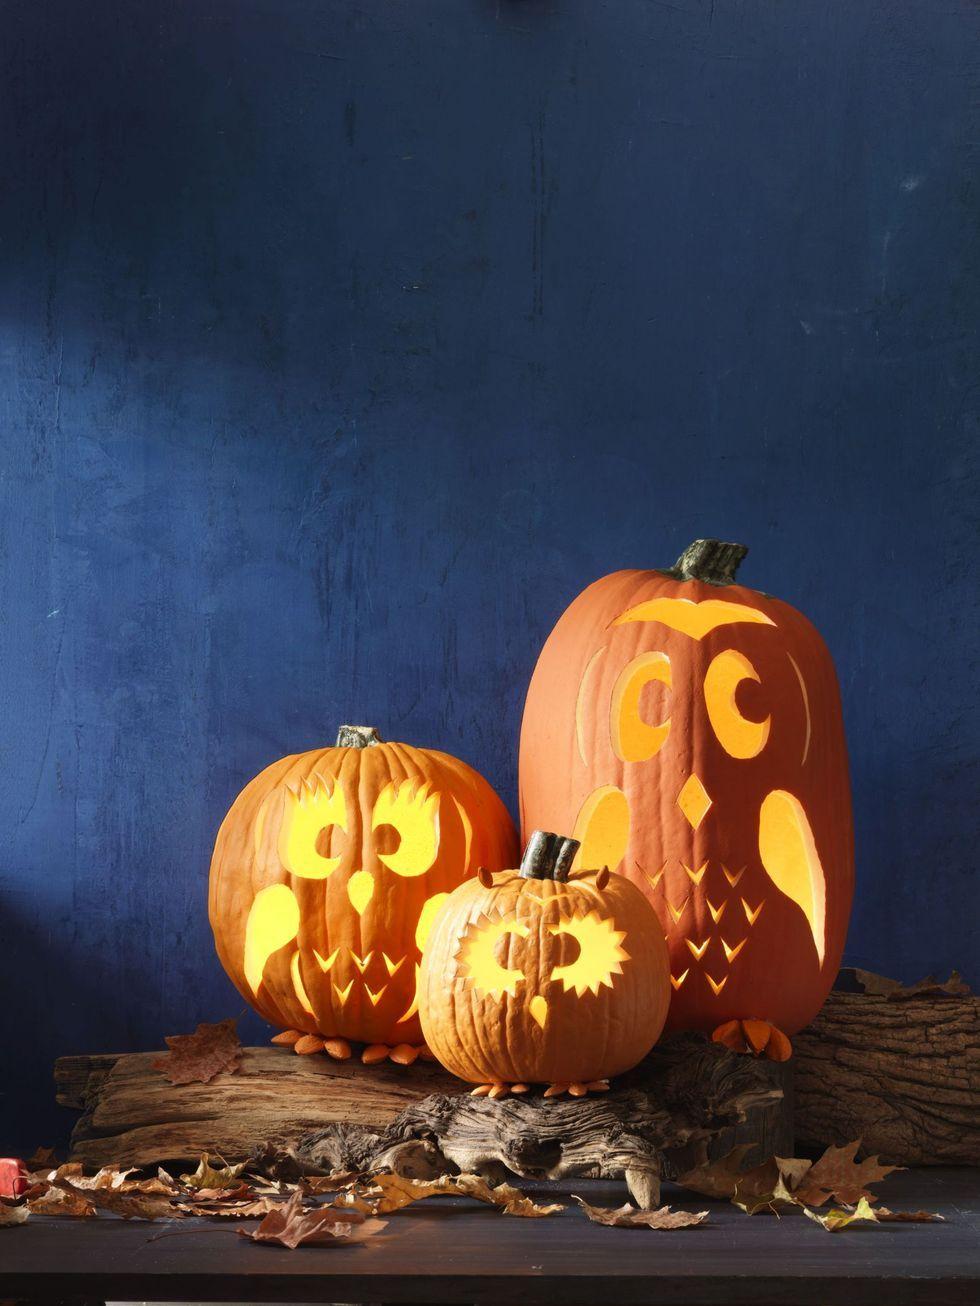 25+ Easy Pumpkin Carving Ideas for Halloween